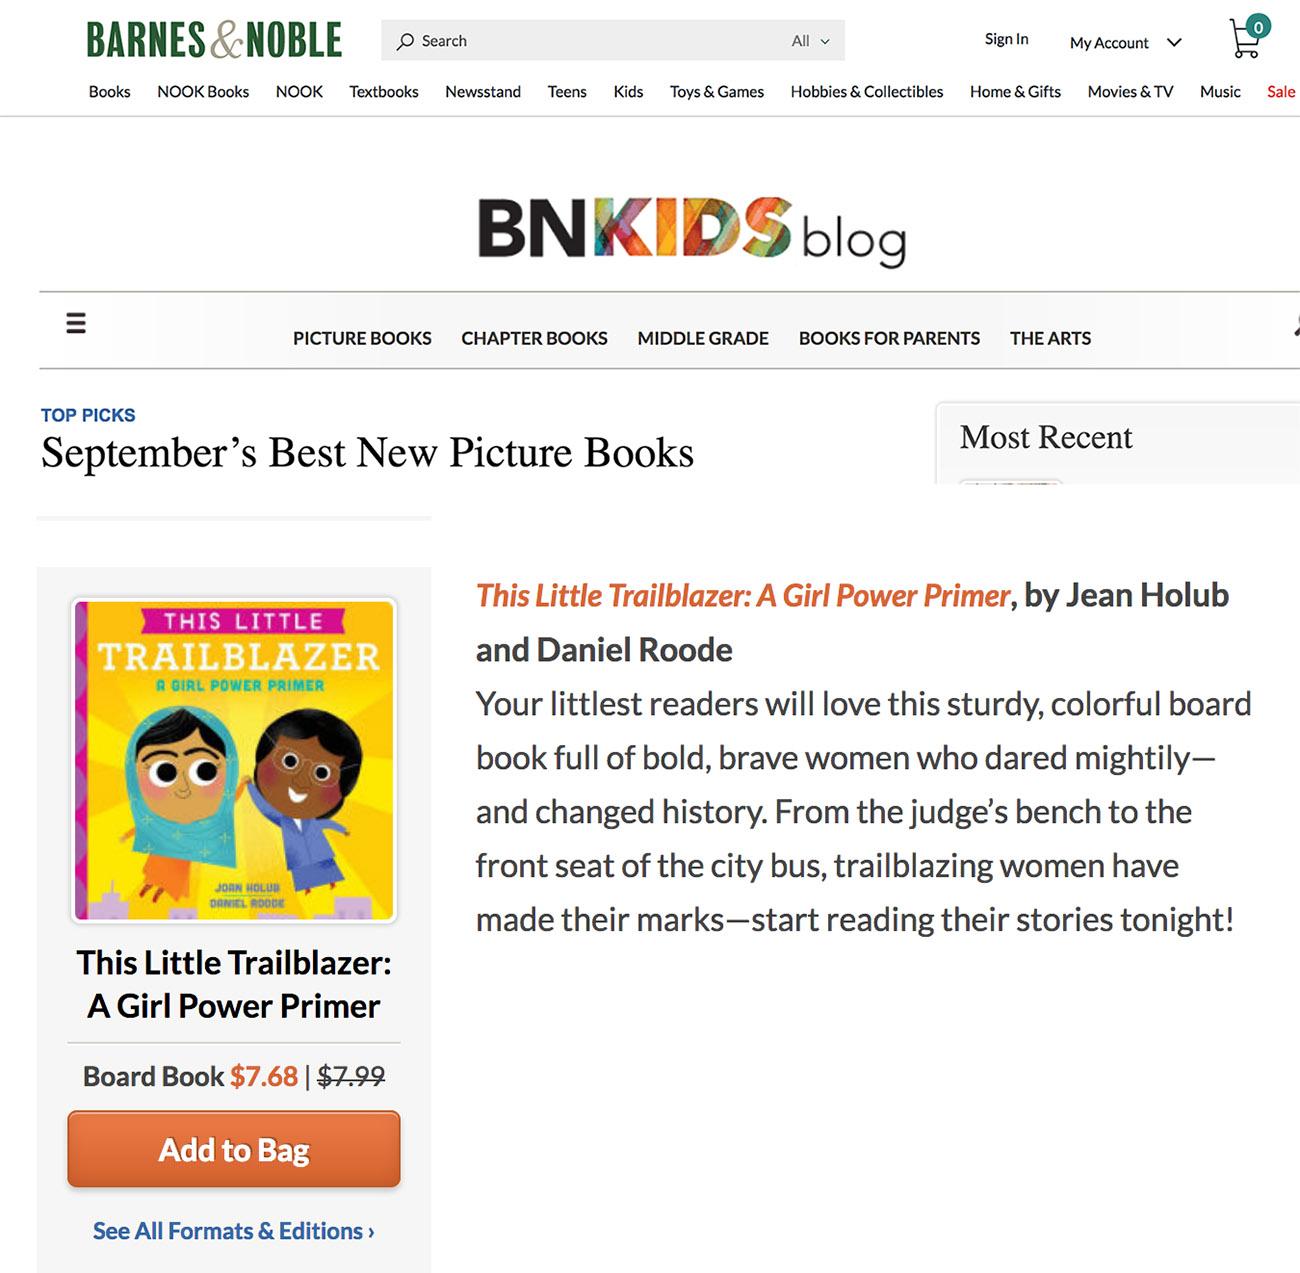 This Little Trailblazer: A Girl Power Primer is a Barnes & Noble ...